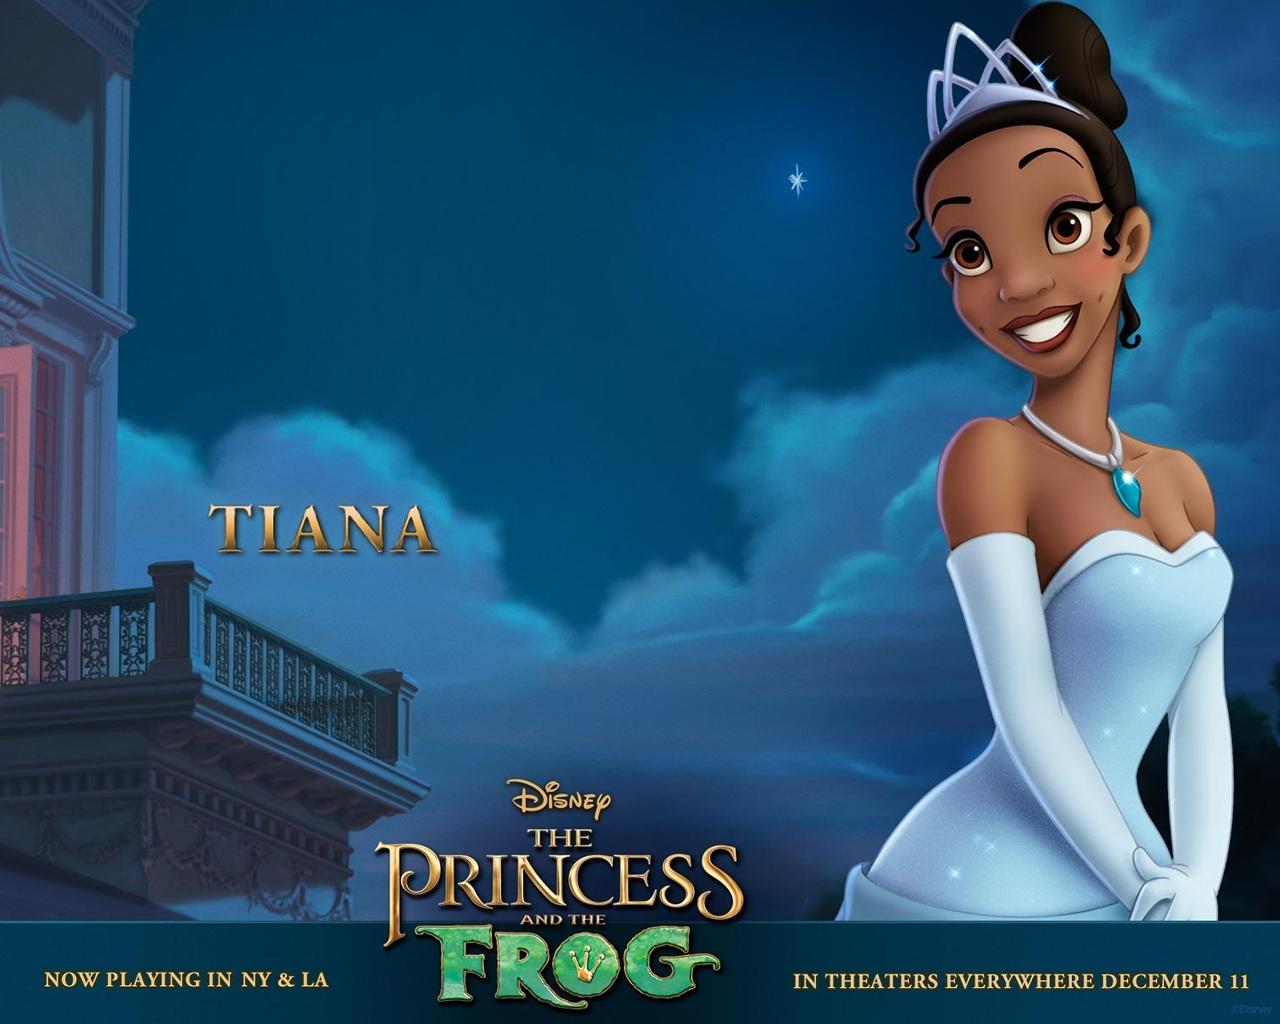 The Princess And The Frog Tiana Wallpaper 1280 X 1024 Pixels